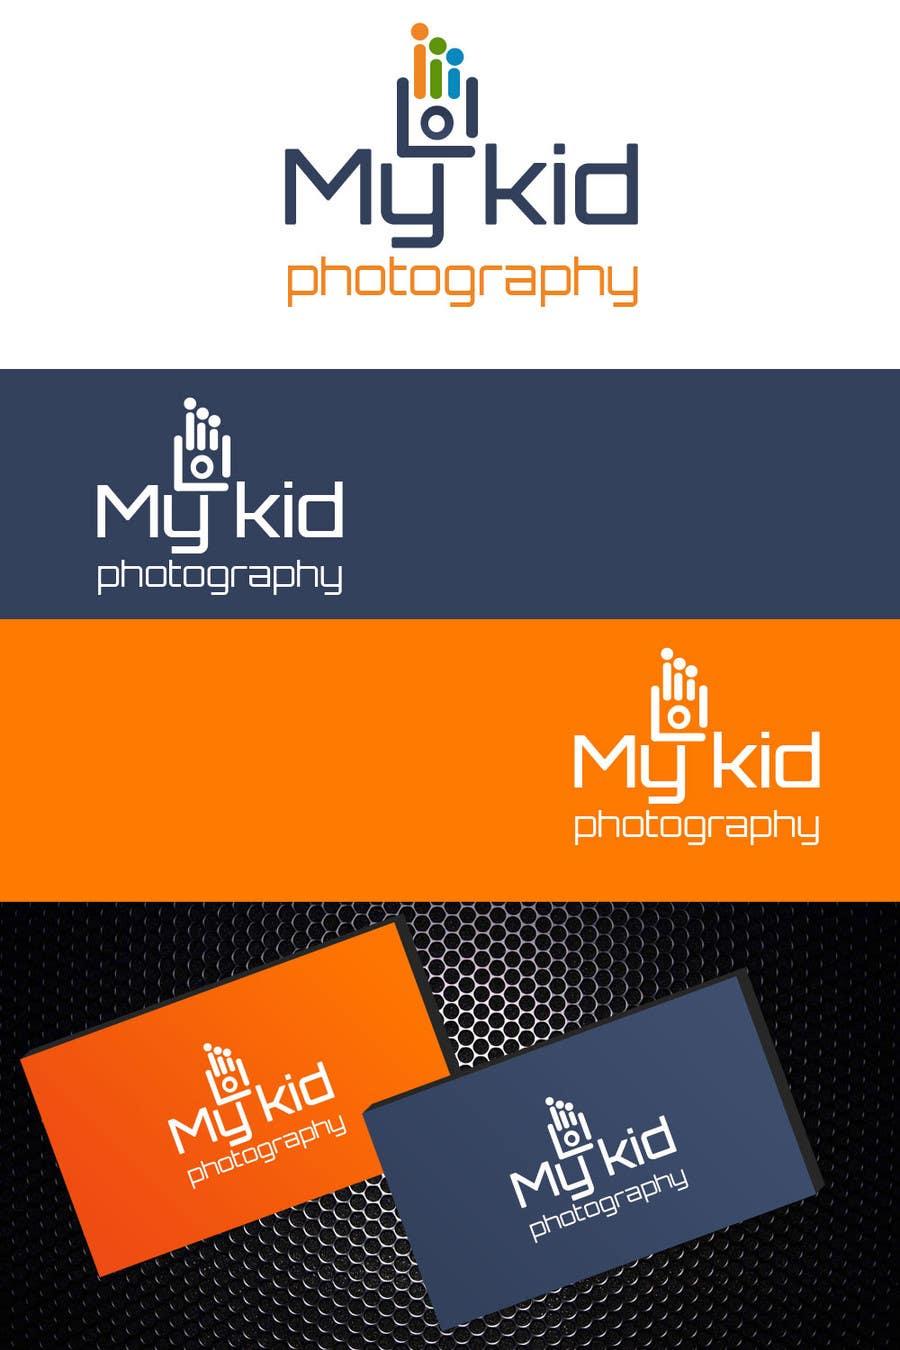 Bài tham dự cuộc thi #235 cho Logo for a photographer